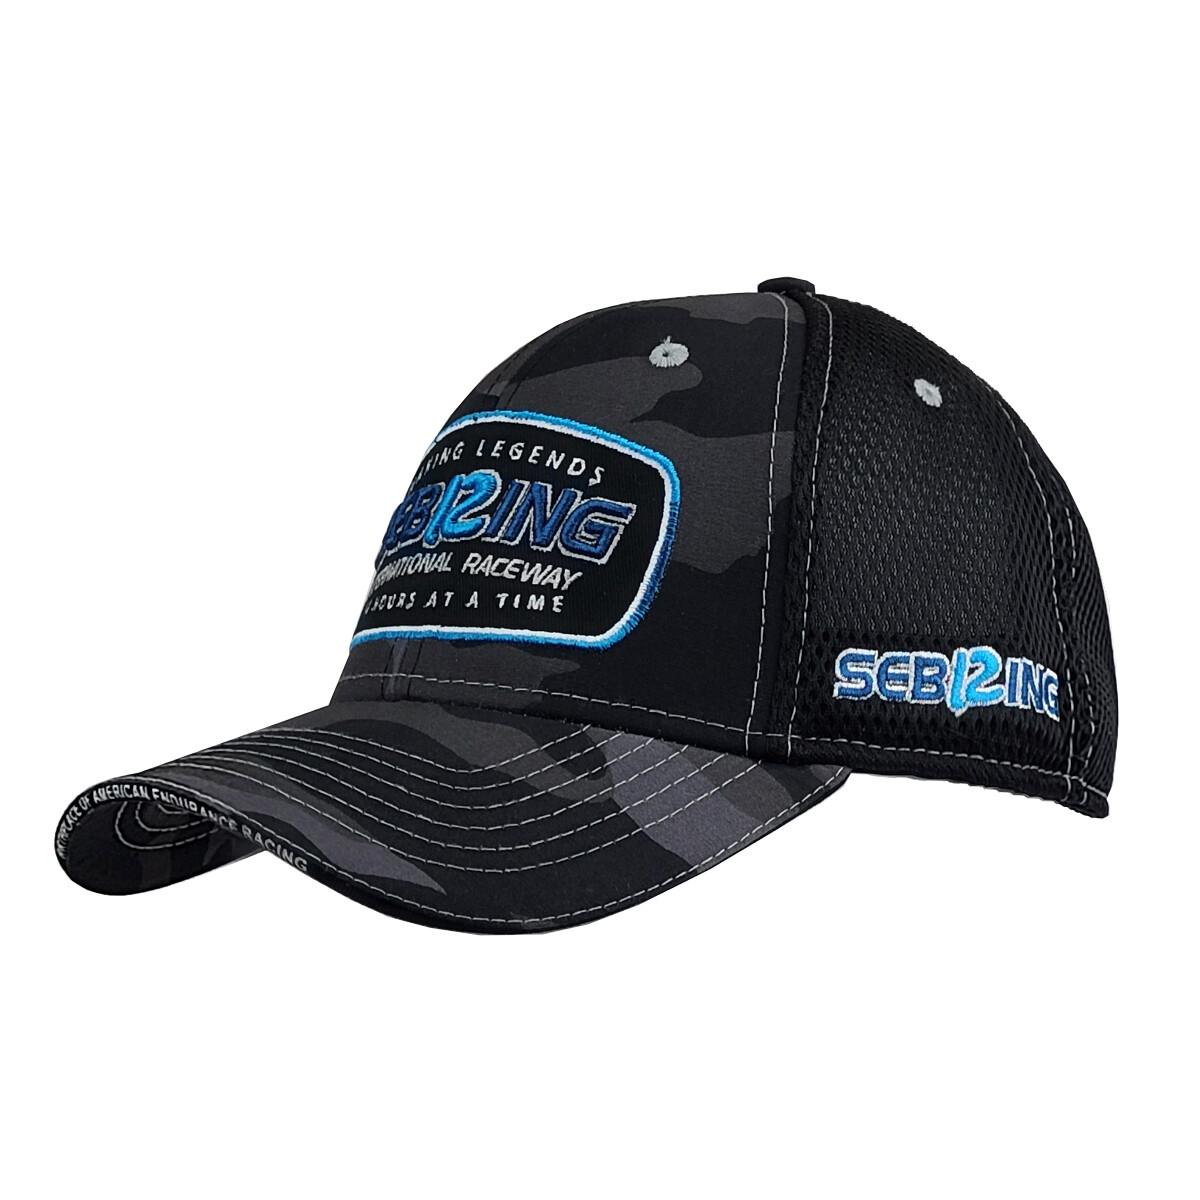 Making Legends Camo Hat- Black